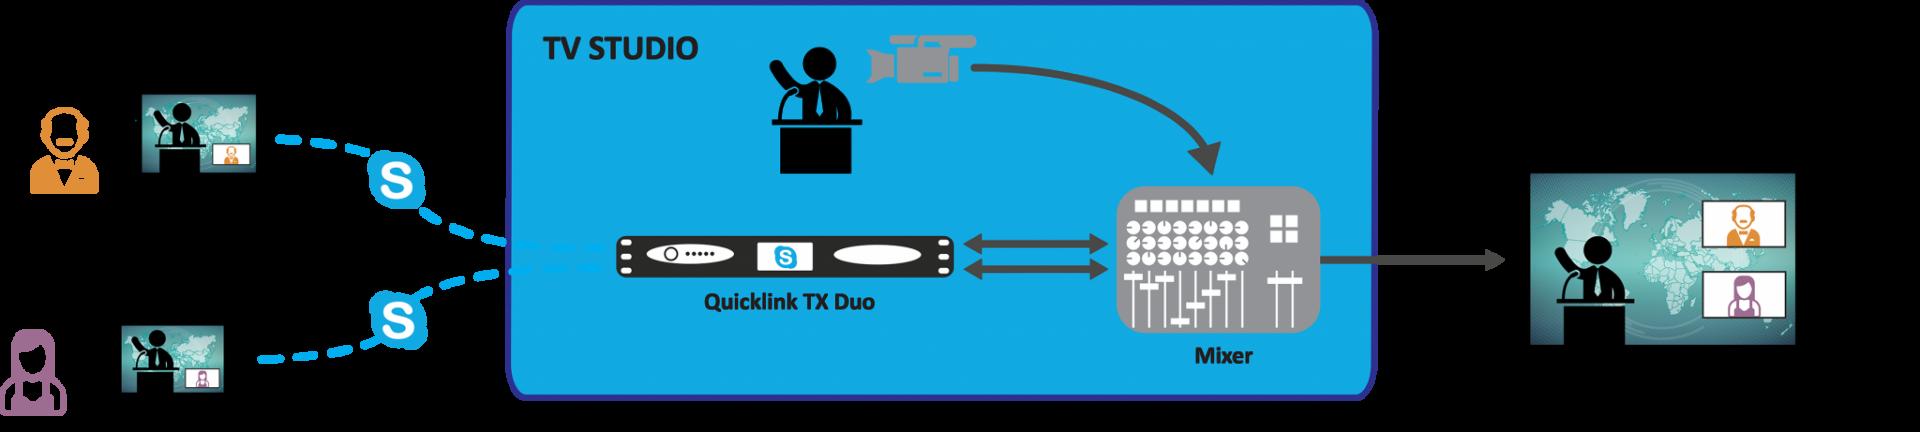 multi-duo-diagram-v4-2